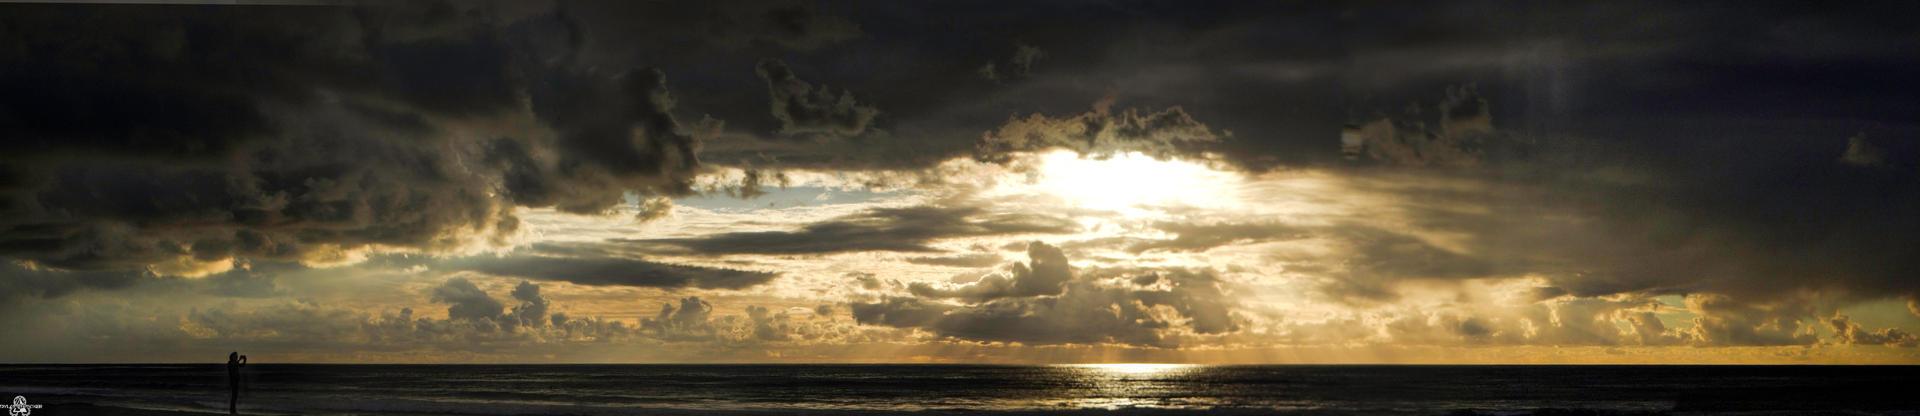 CloudTheSky by DylanStricker